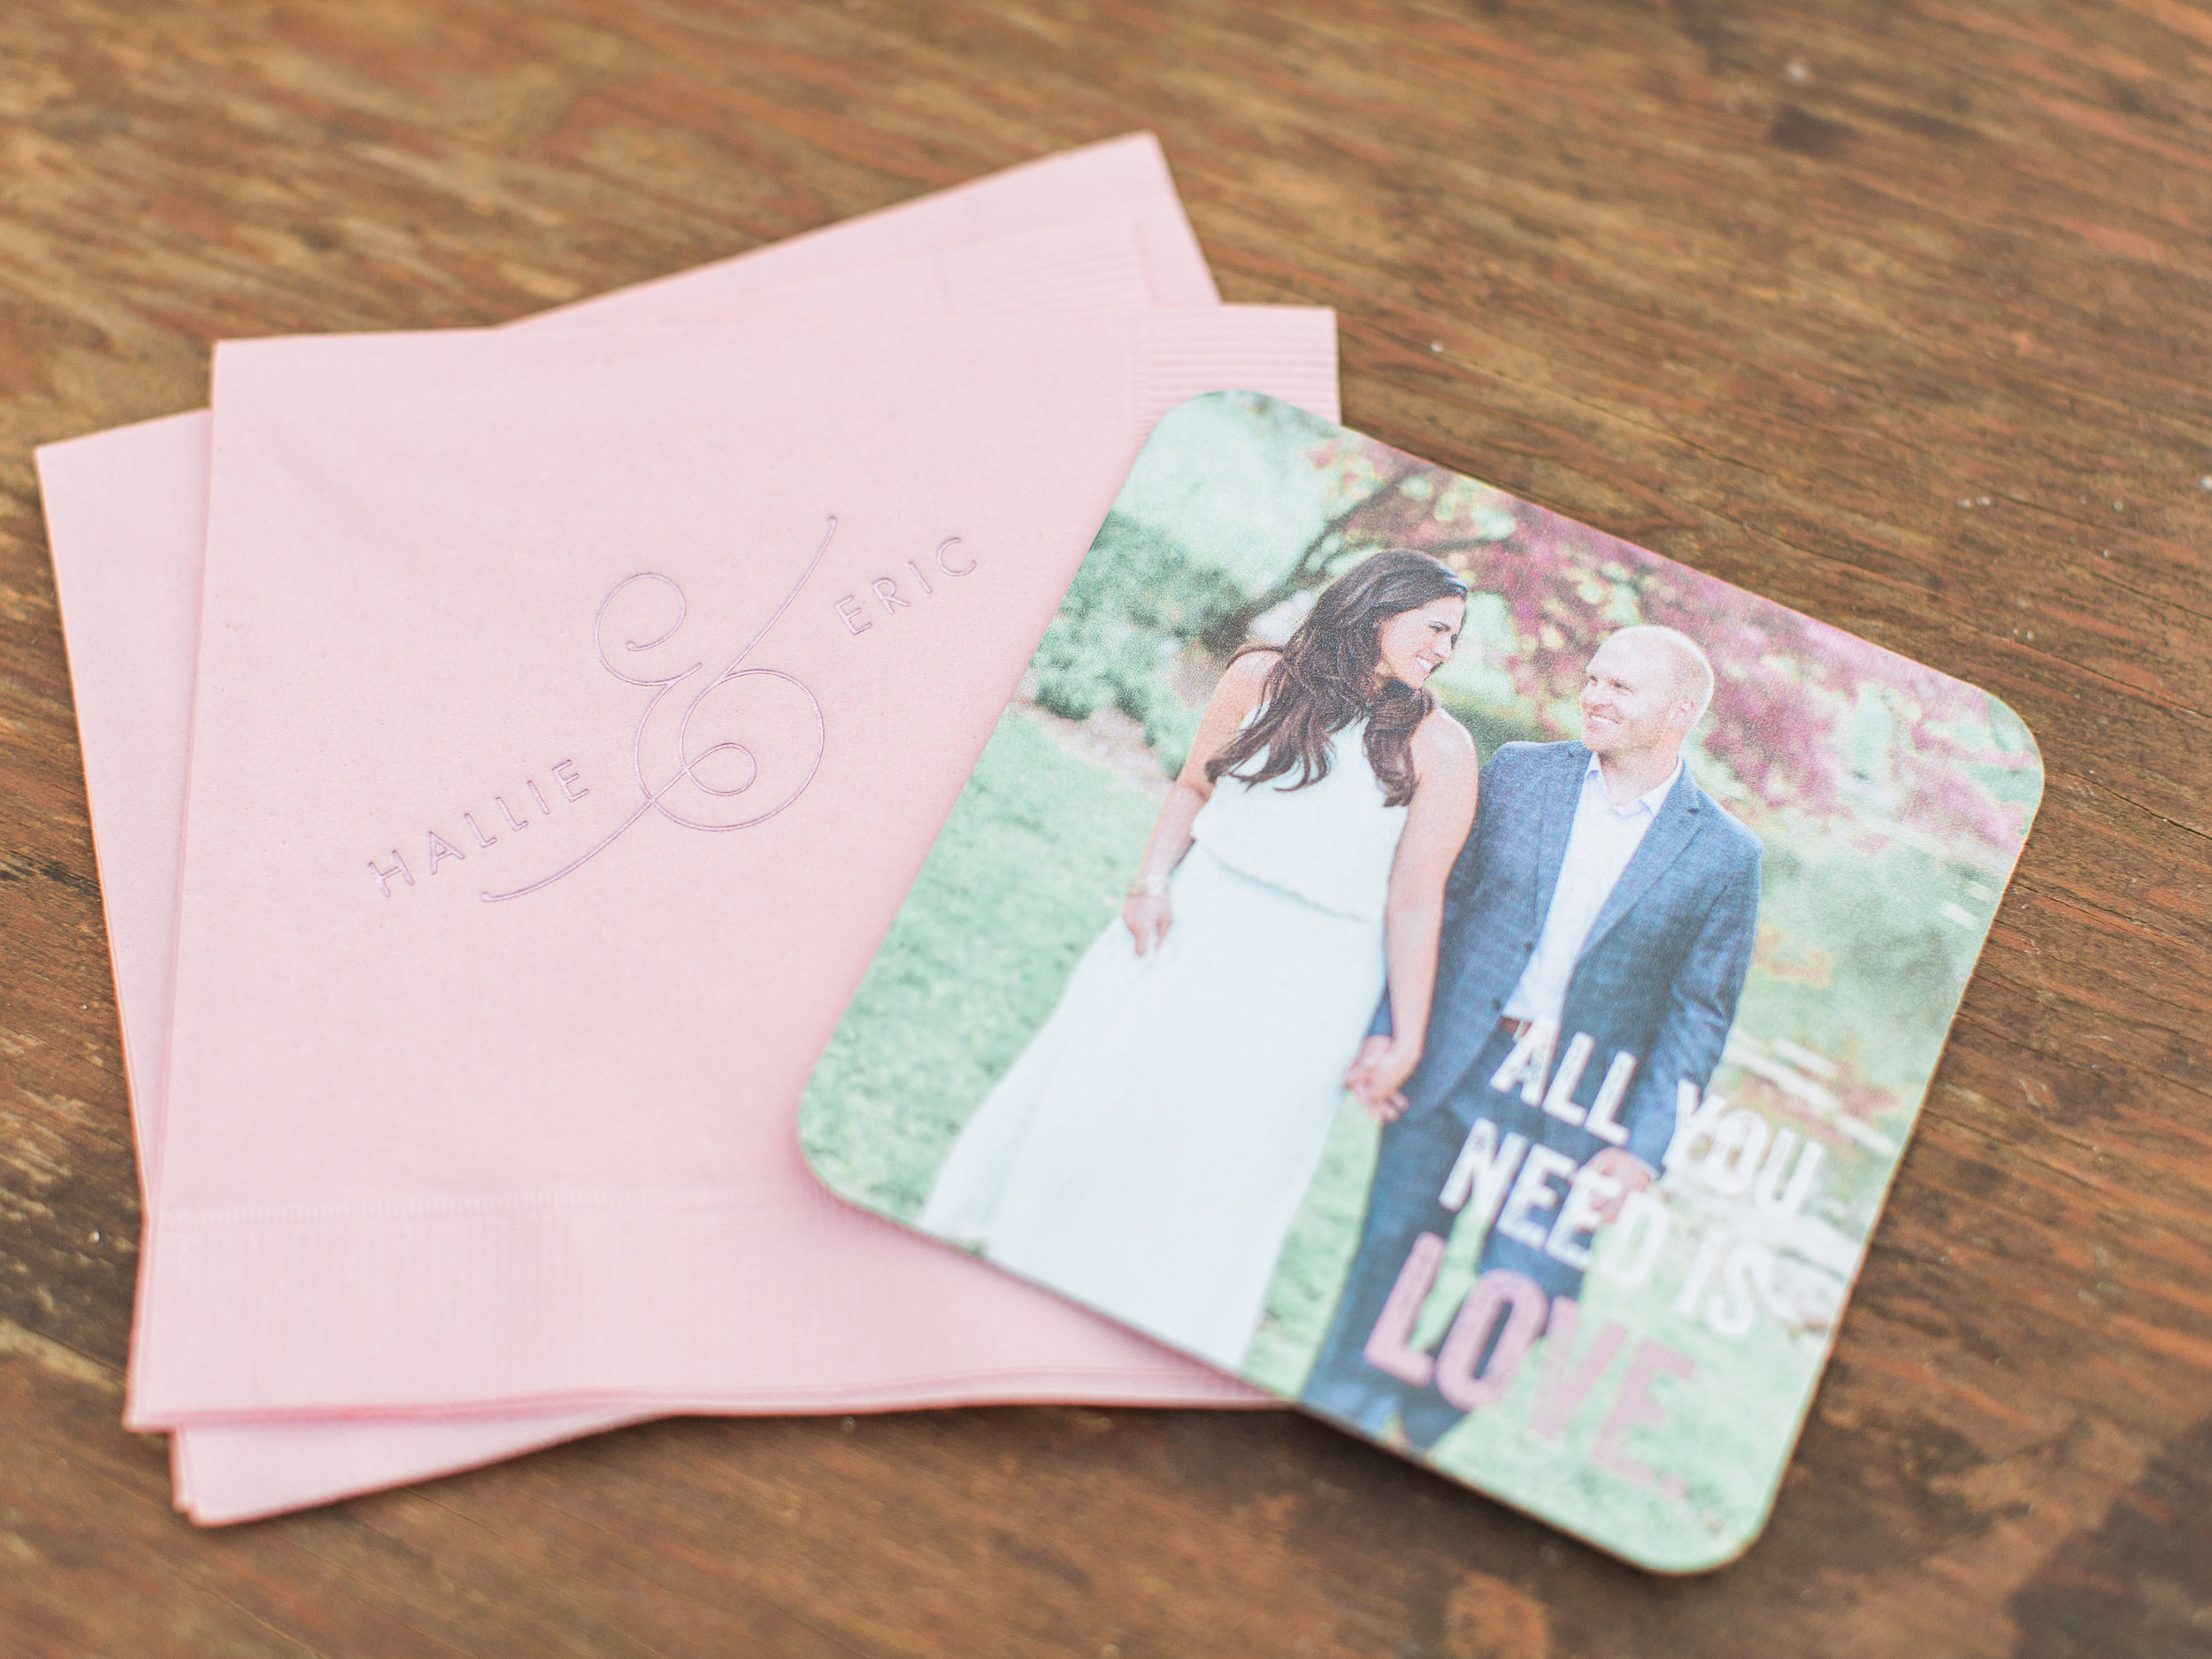 ERIC AND HALLIE WEDDING-HI RESOLUTION FOR PRINTING-0816.jpg